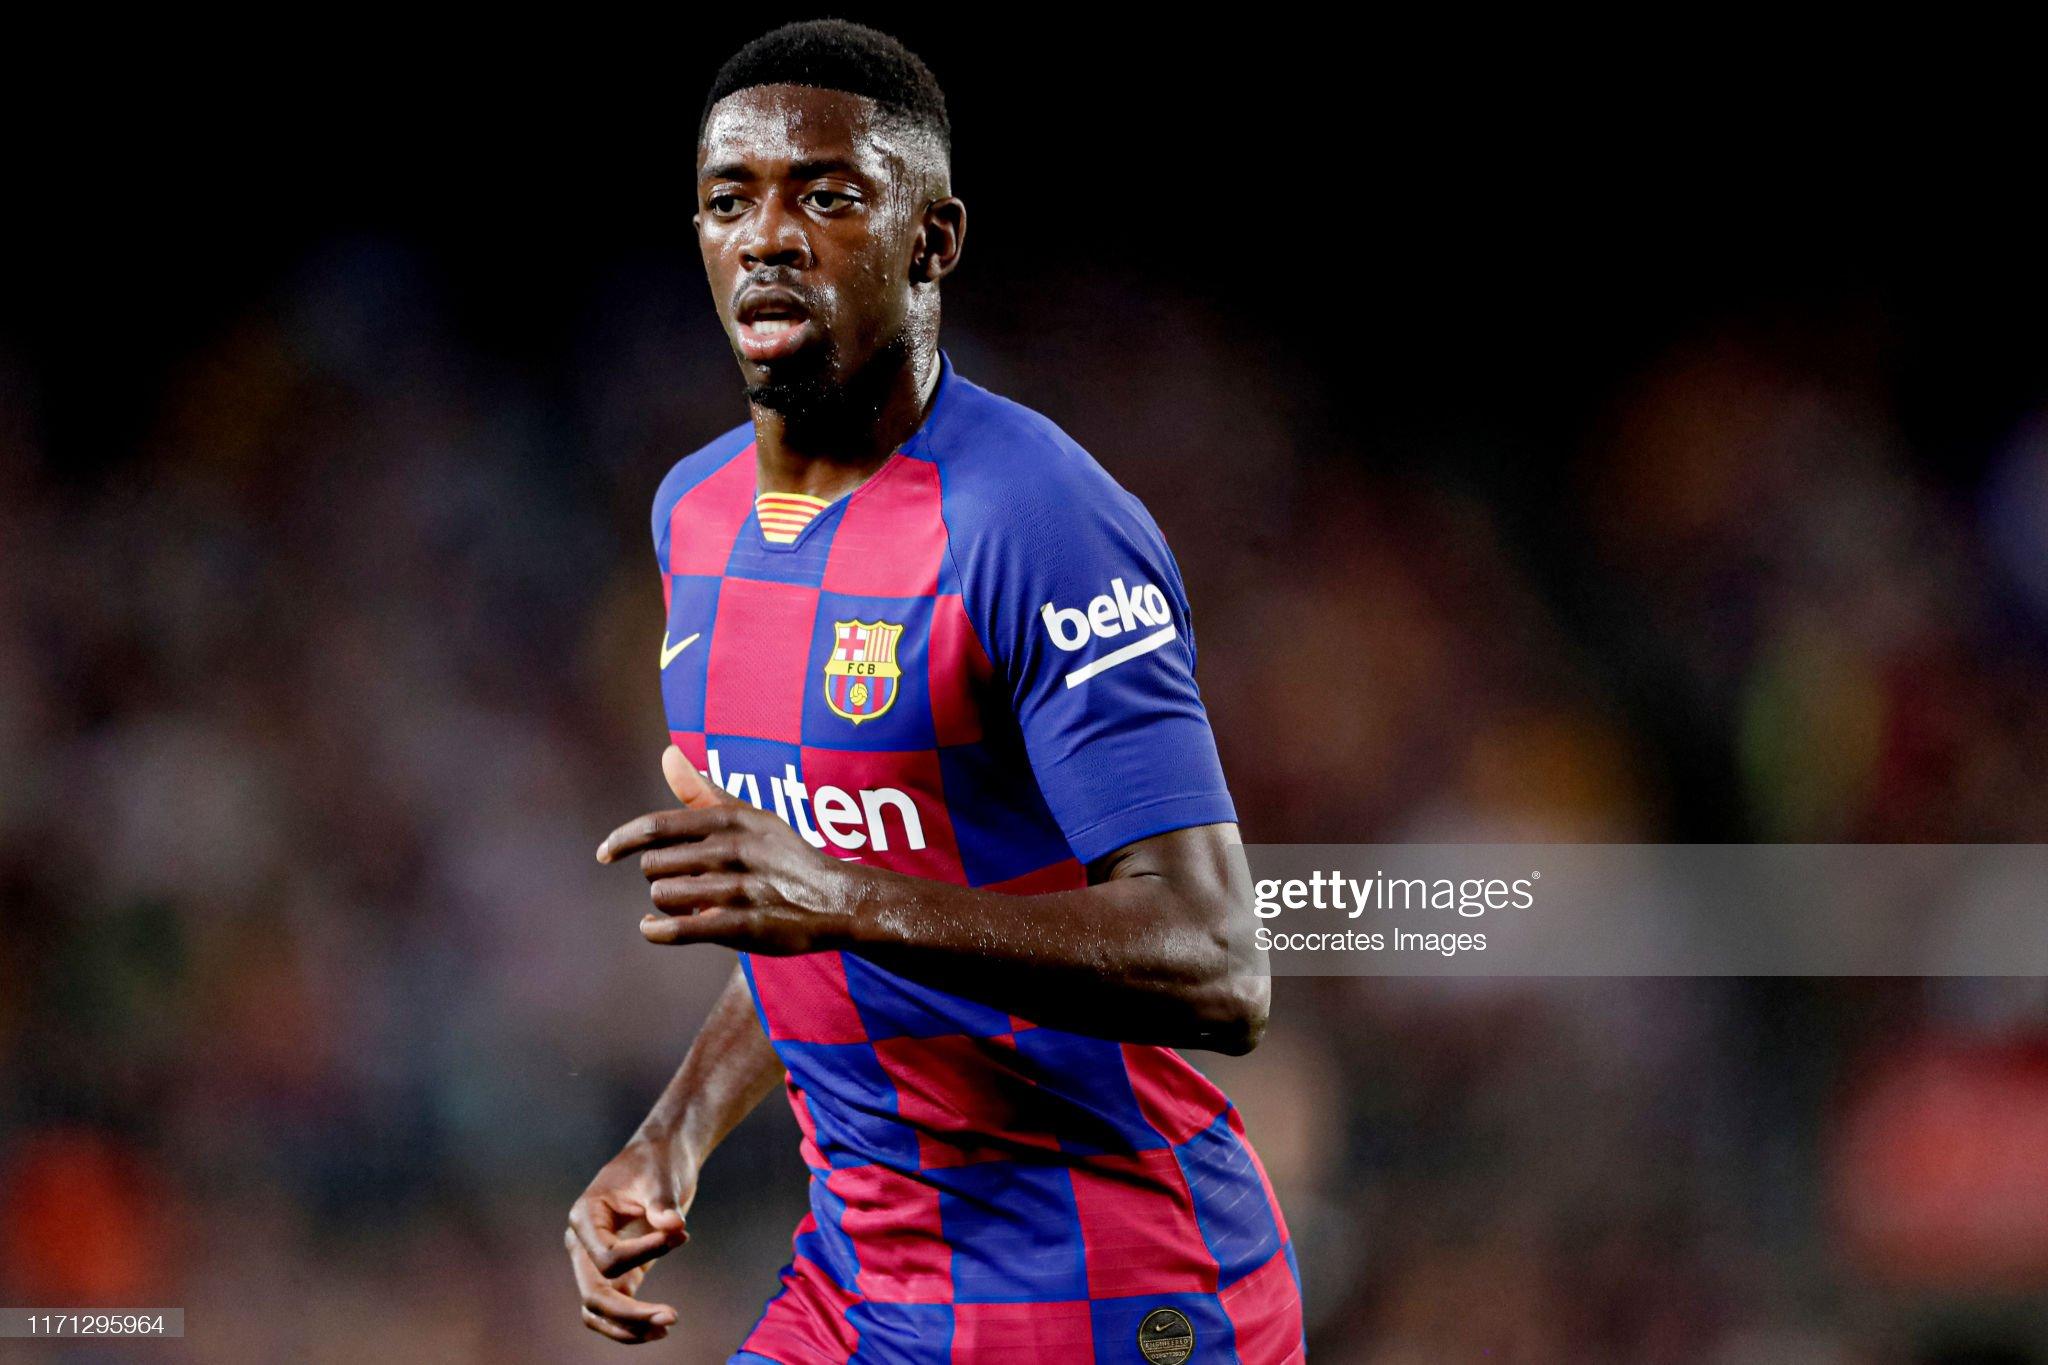 صور مباراة : برشلونة - فياريال 2-1 ( 24-09-2019 )  Ousmane-dembele-of-fc-barcelona-during-the-la-liga-santander-match-picture-id1171295964?s=2048x2048